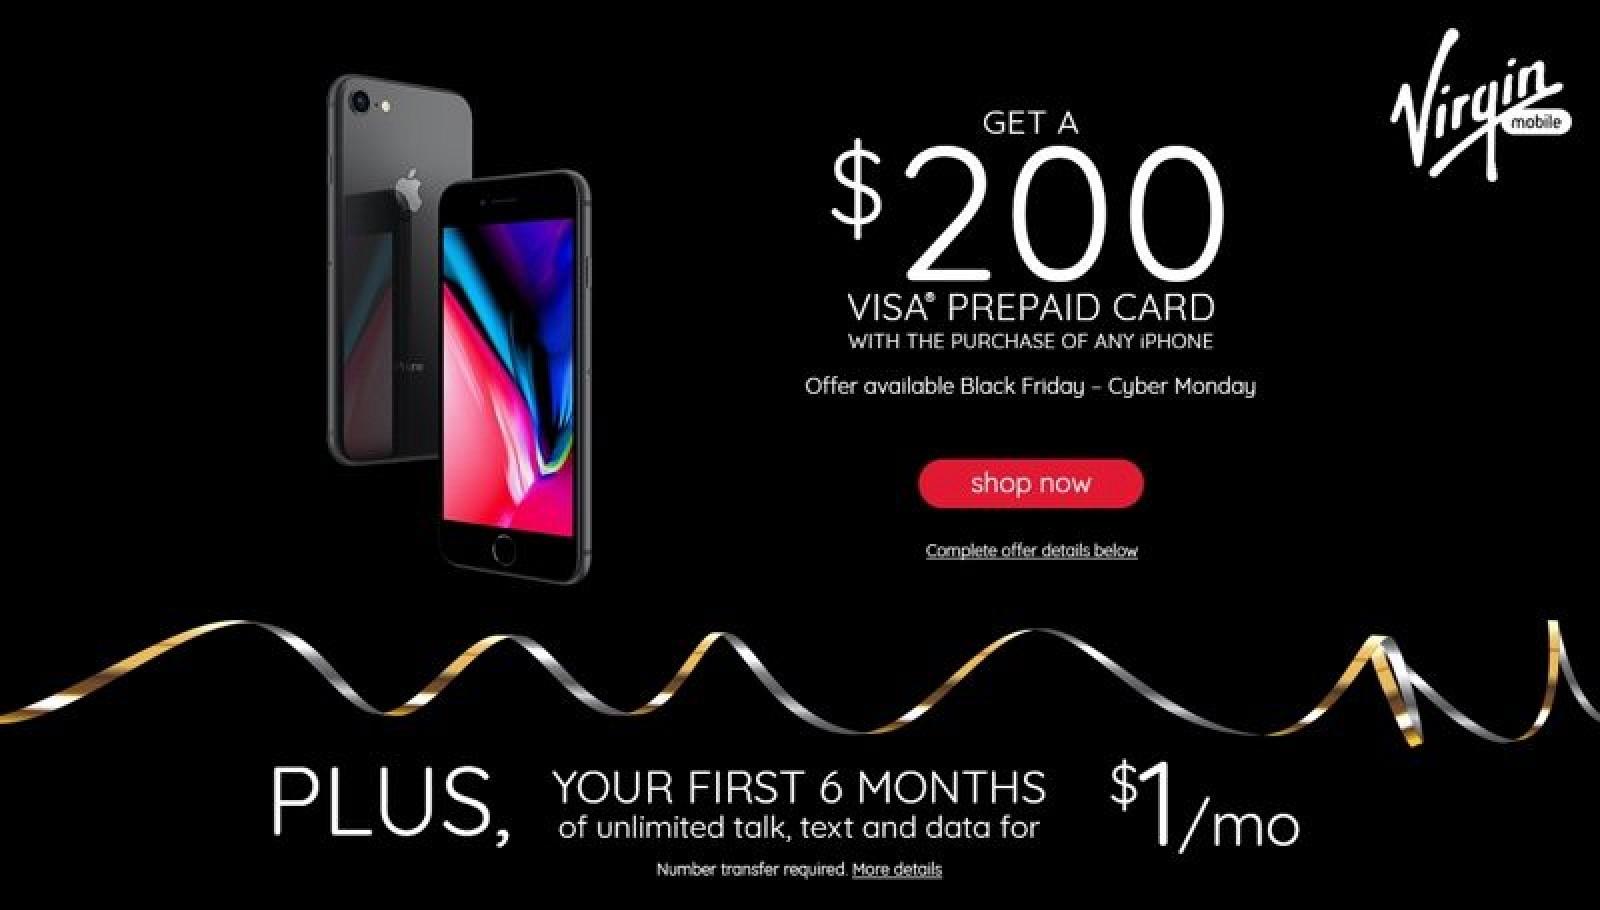 Best Buy Virgin Mobile Iphone Black Friday